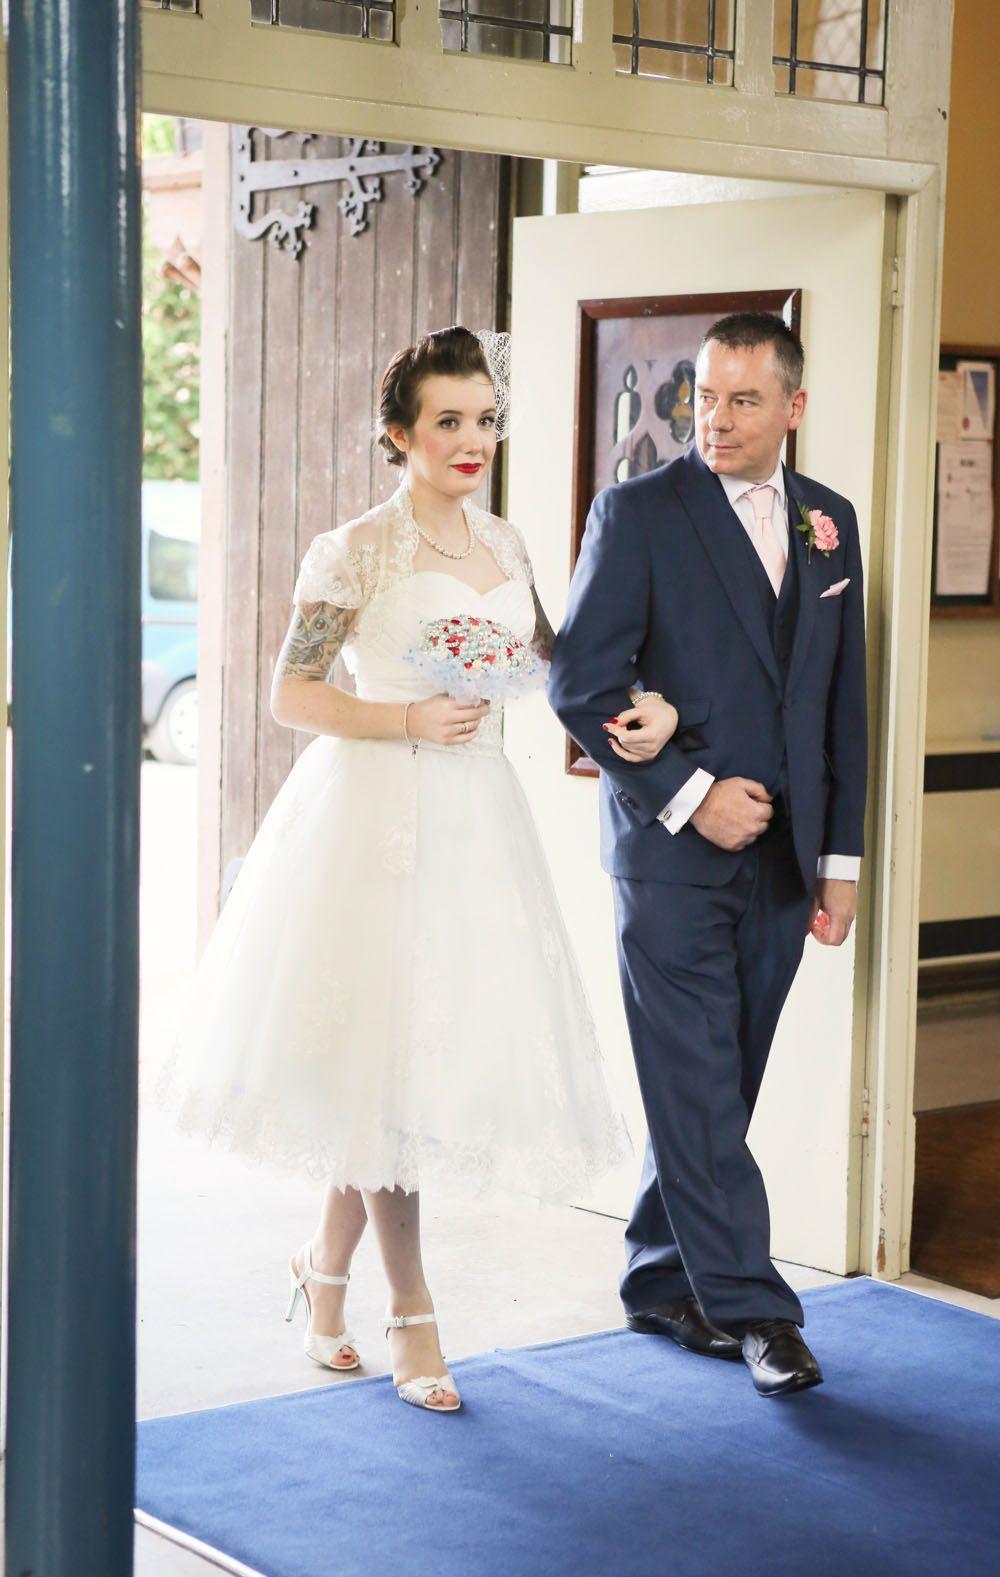 1950s Americana Wedding · Rock n Roll Bride | renewing the vows ...